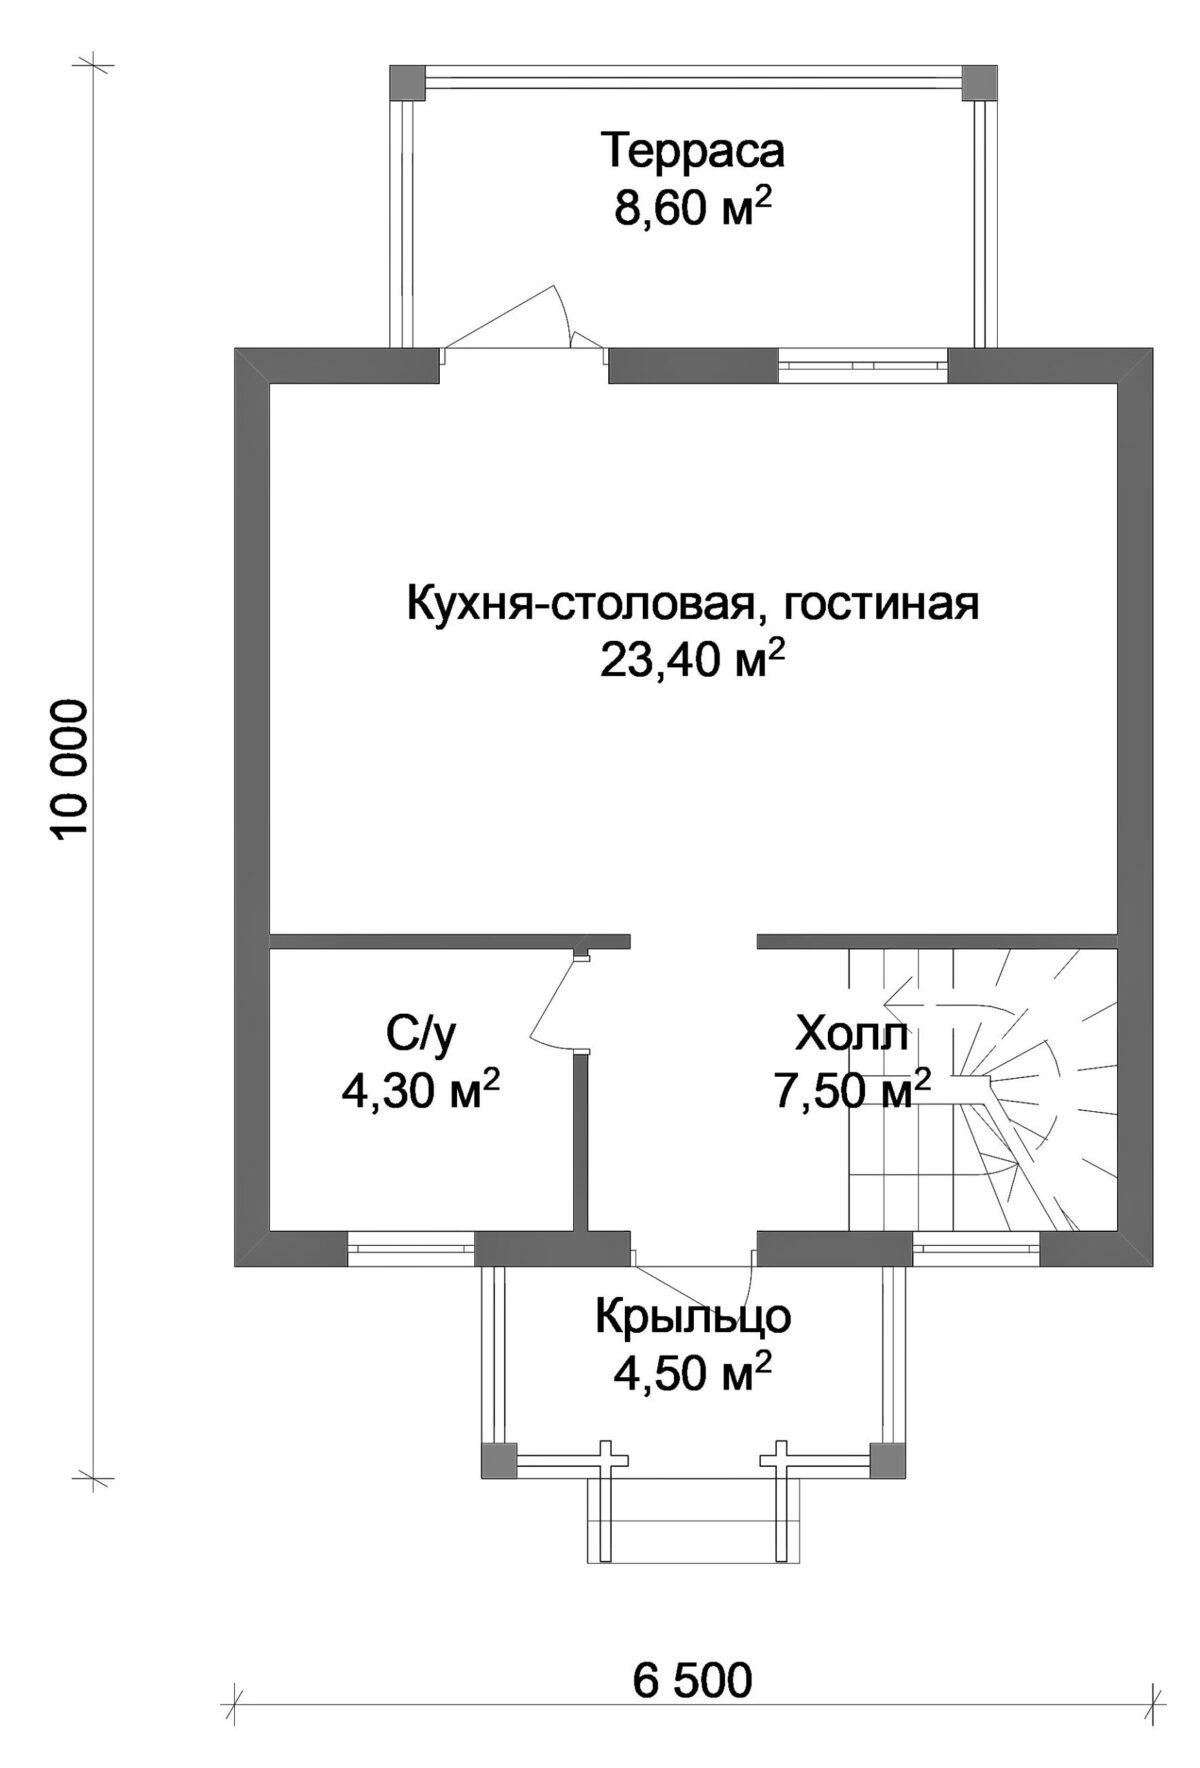 Йорген A-019. Проект небольшого мансардного дома на 2 спальни, с террасой